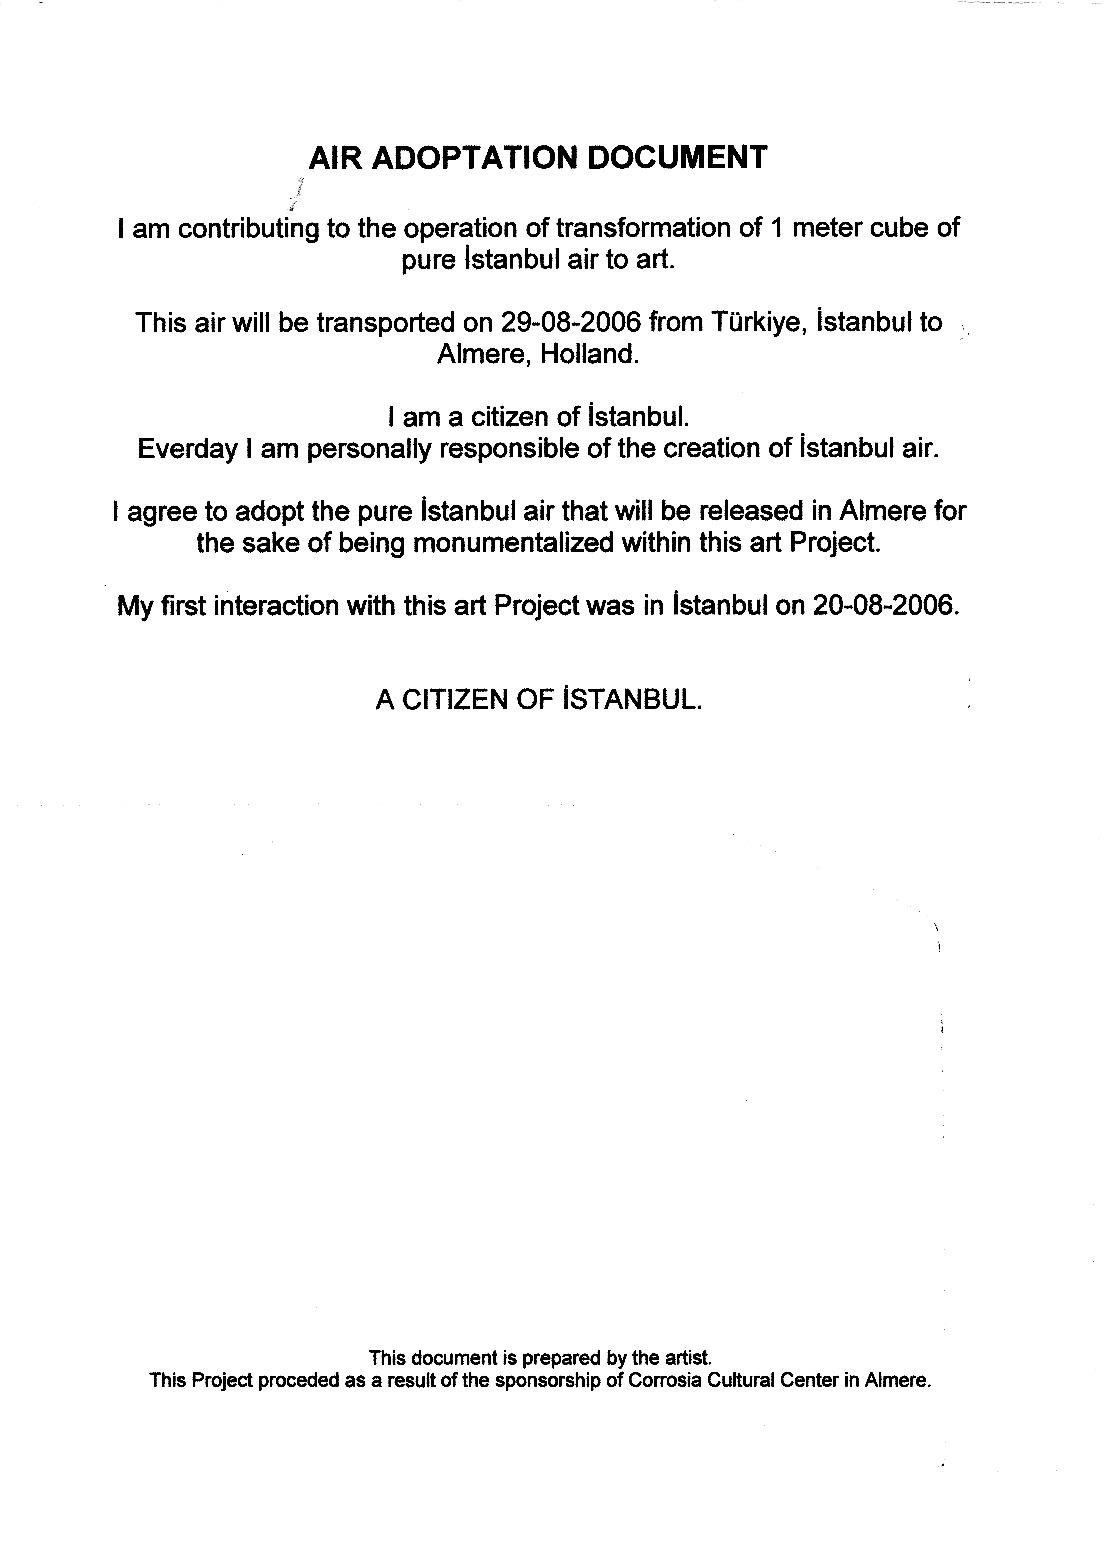 image1_airadoptation_istanbul